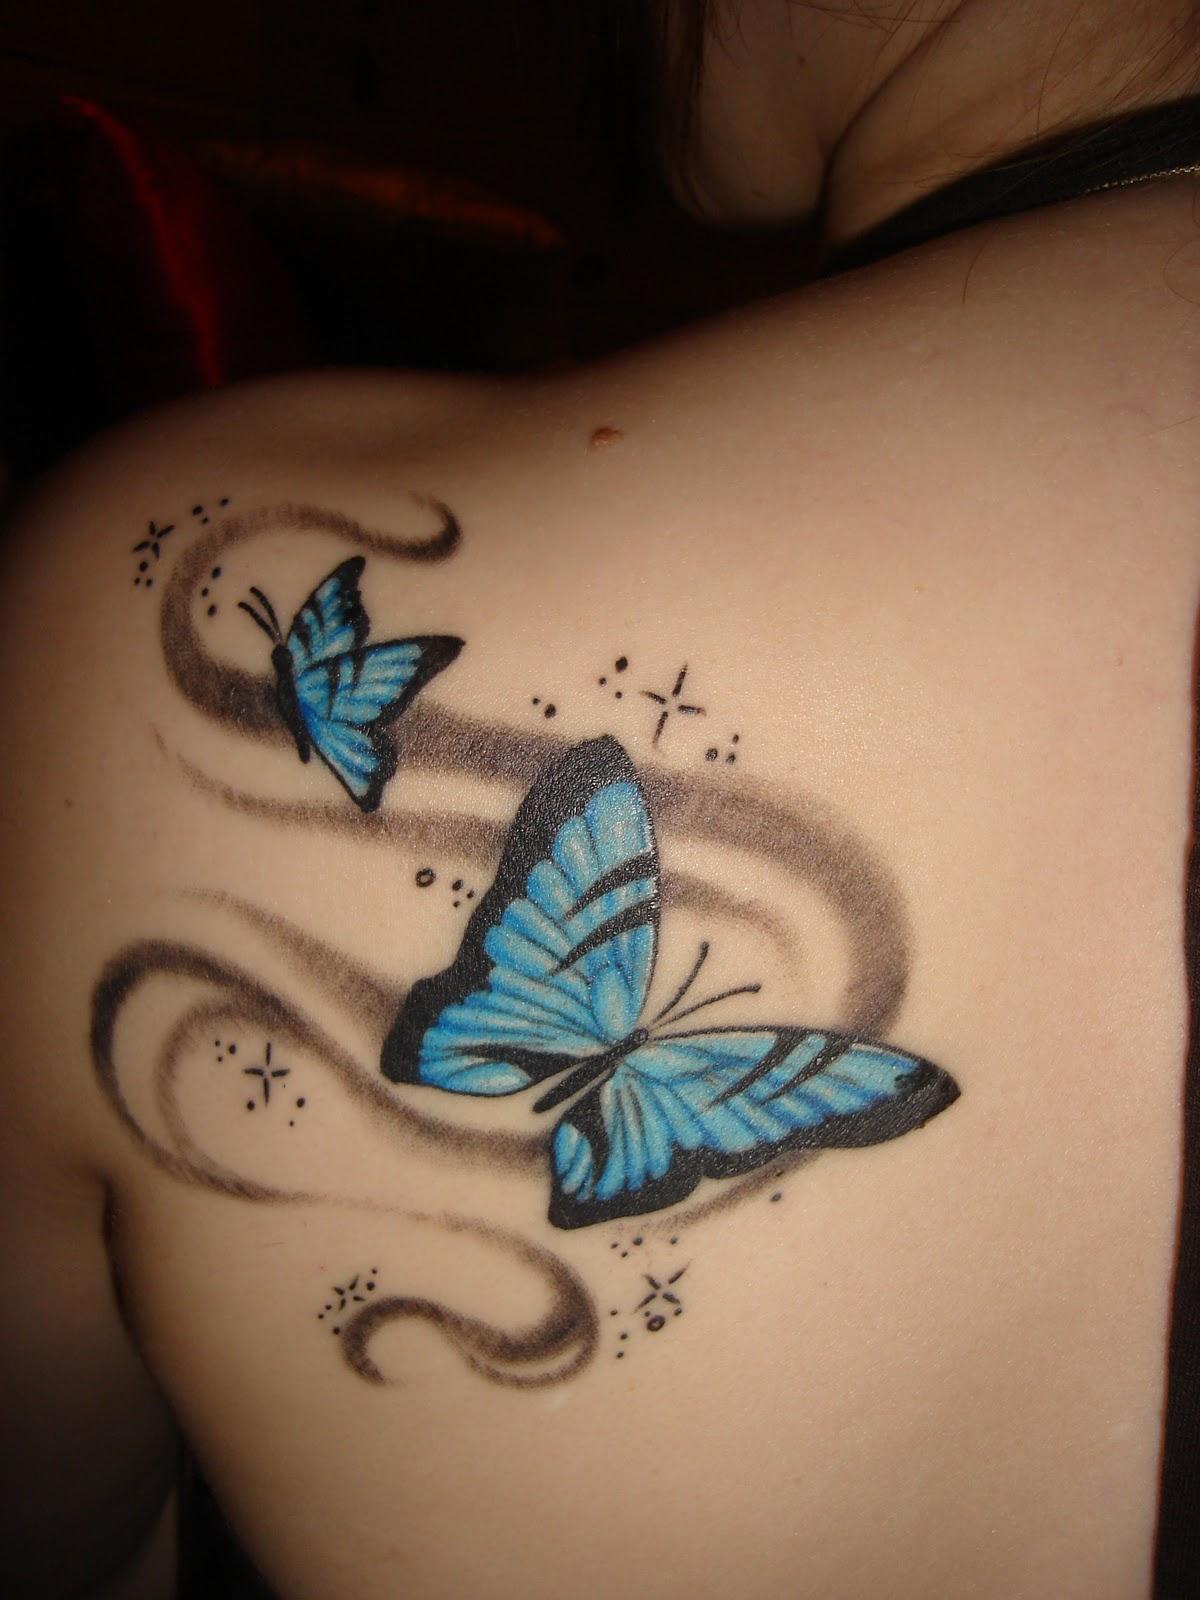 tattoo%2bideas%2bfor%2bkids%2bnames3